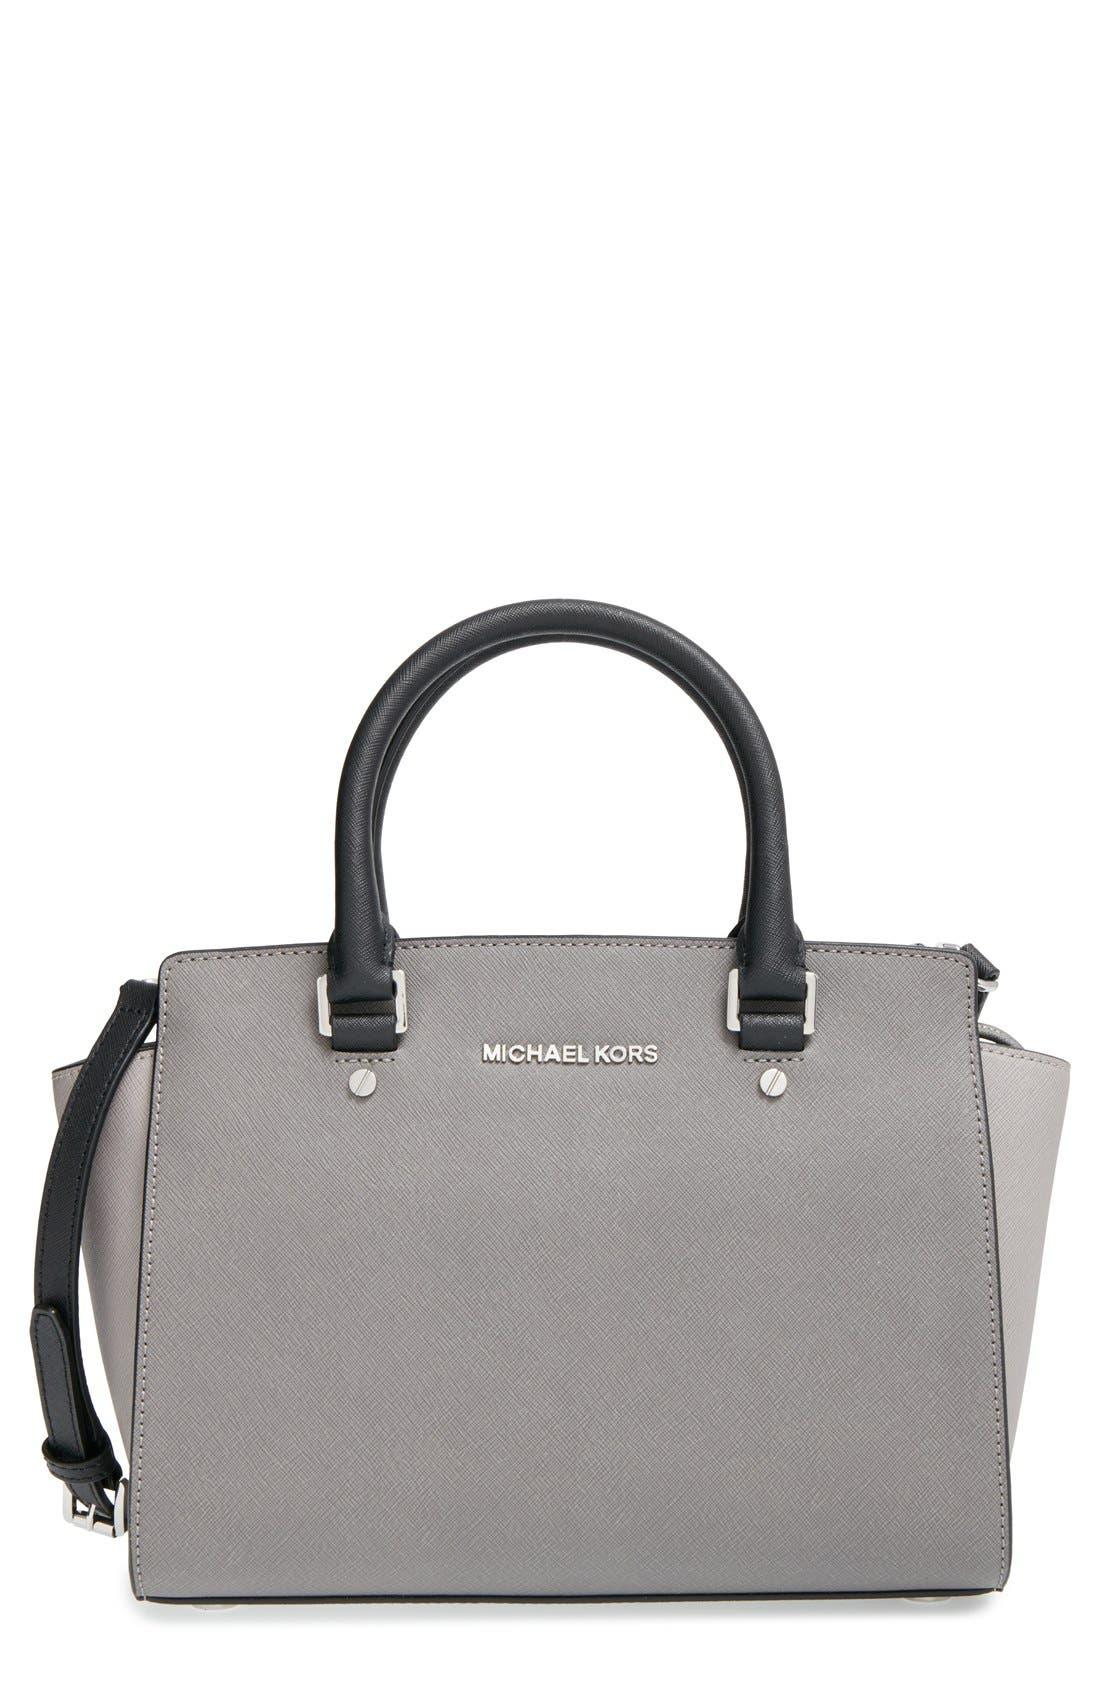 Alternate Image 1 Selected - MICHAEL Michael Kors 'Selma - Medium' Saffiano Leather Crossbody Bag